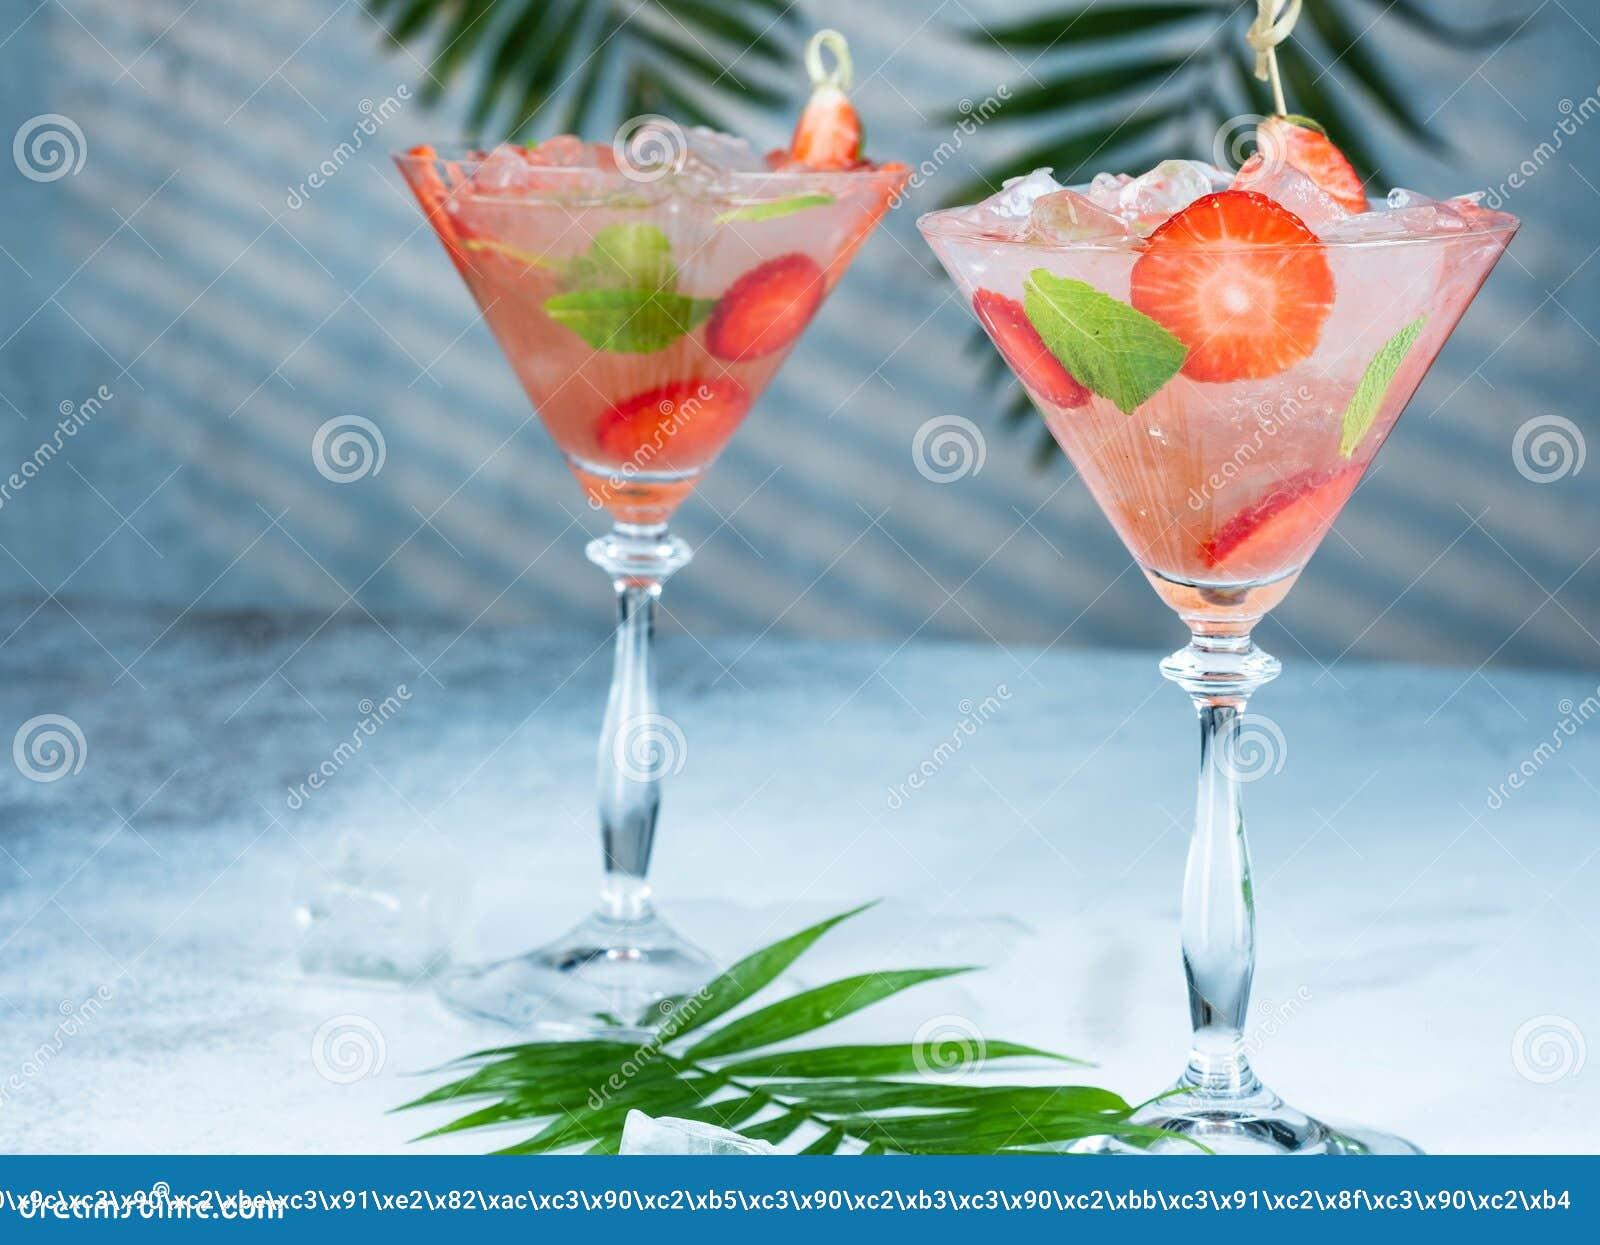 Jordgubbelemonad eller alkoholistcoctail med sidor f?r f?r issirapsodavatten och mintkaramell p? st?ngtabellen